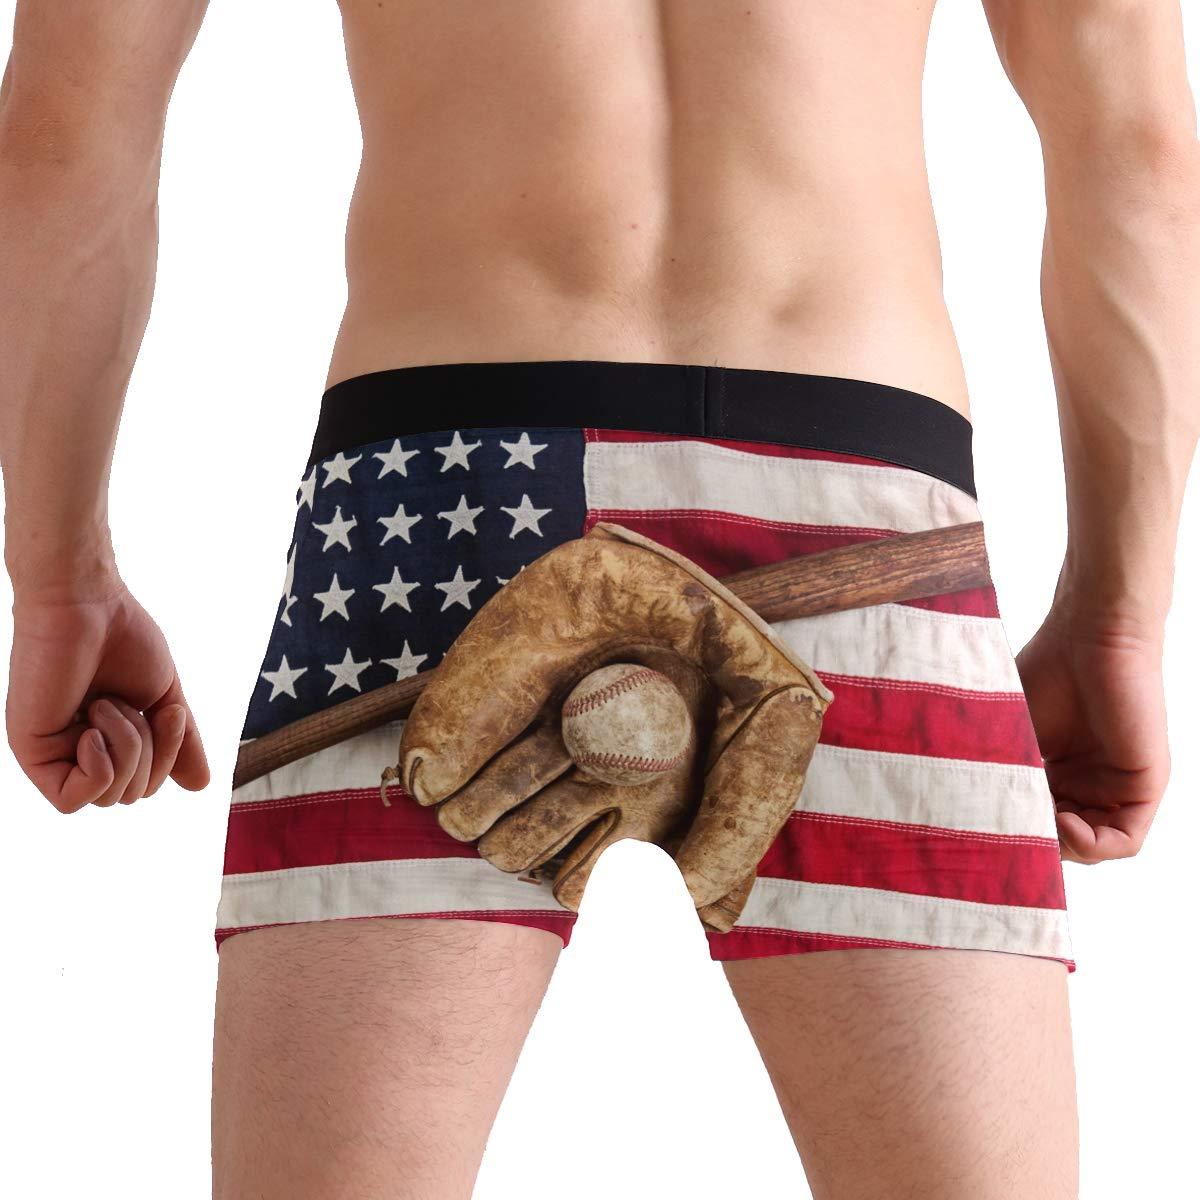 MOFEIYUE Mens Boxer Briefs Sport Baseball American Flag Soft Short Underpants Underwear for Men Boys